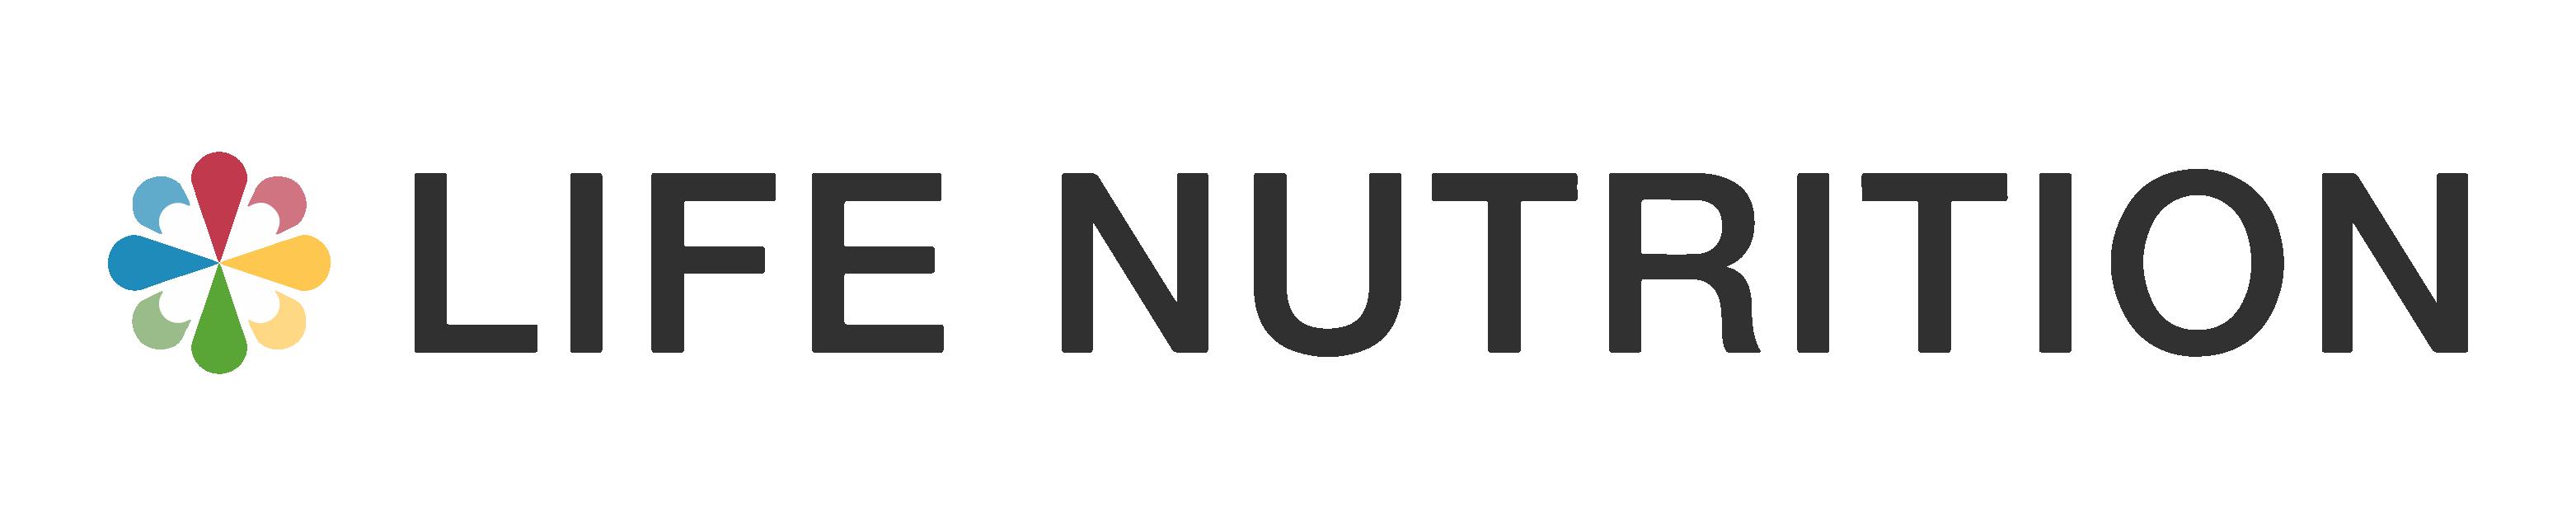 Life Nutrition Logo